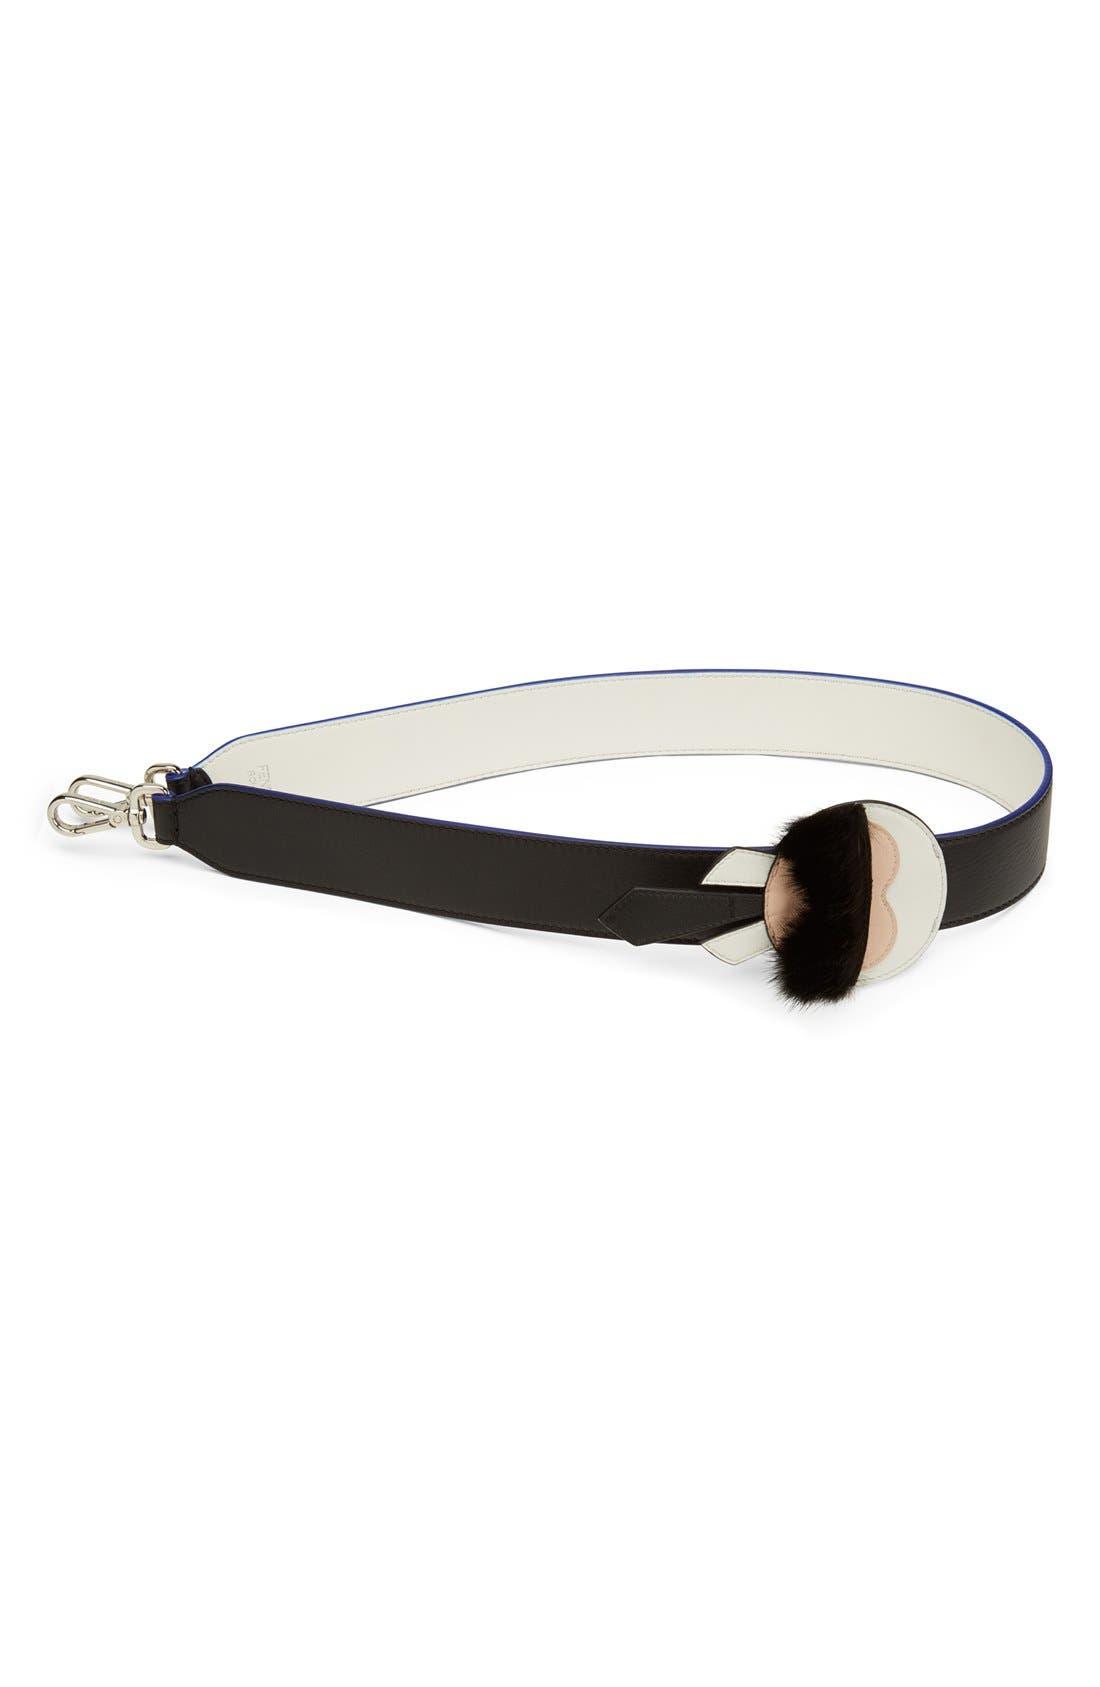 Alternate Image 1 Selected - Fendi 'Strap You - Karlito' Leather & Genuine Mink Fur Bag Strap